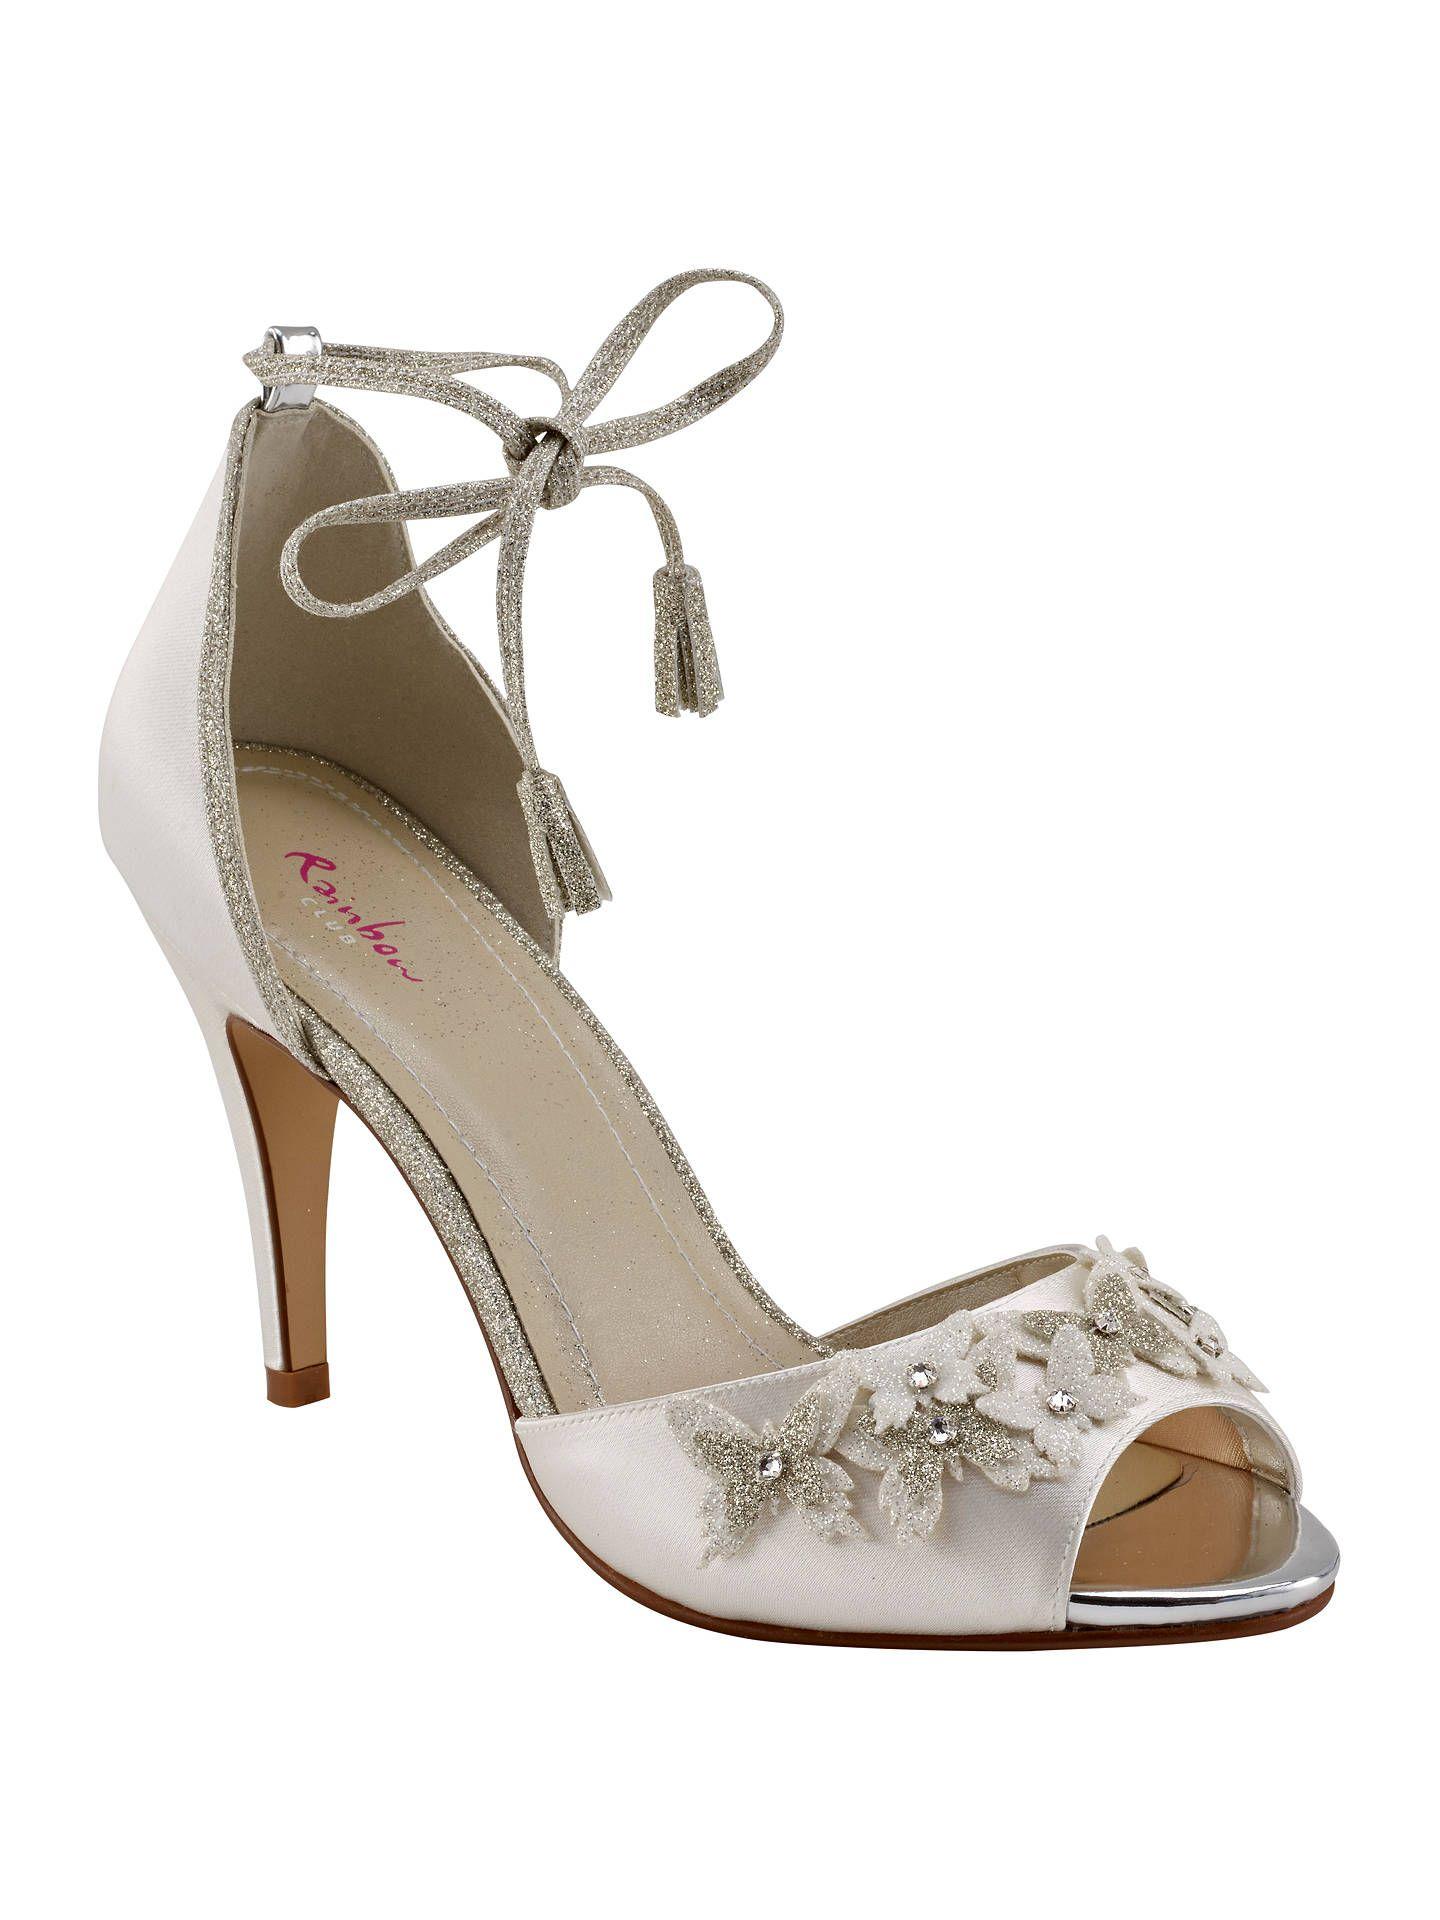 ac9c9064b4a6 Rainbow Club Zarah Peep Toe Sandals